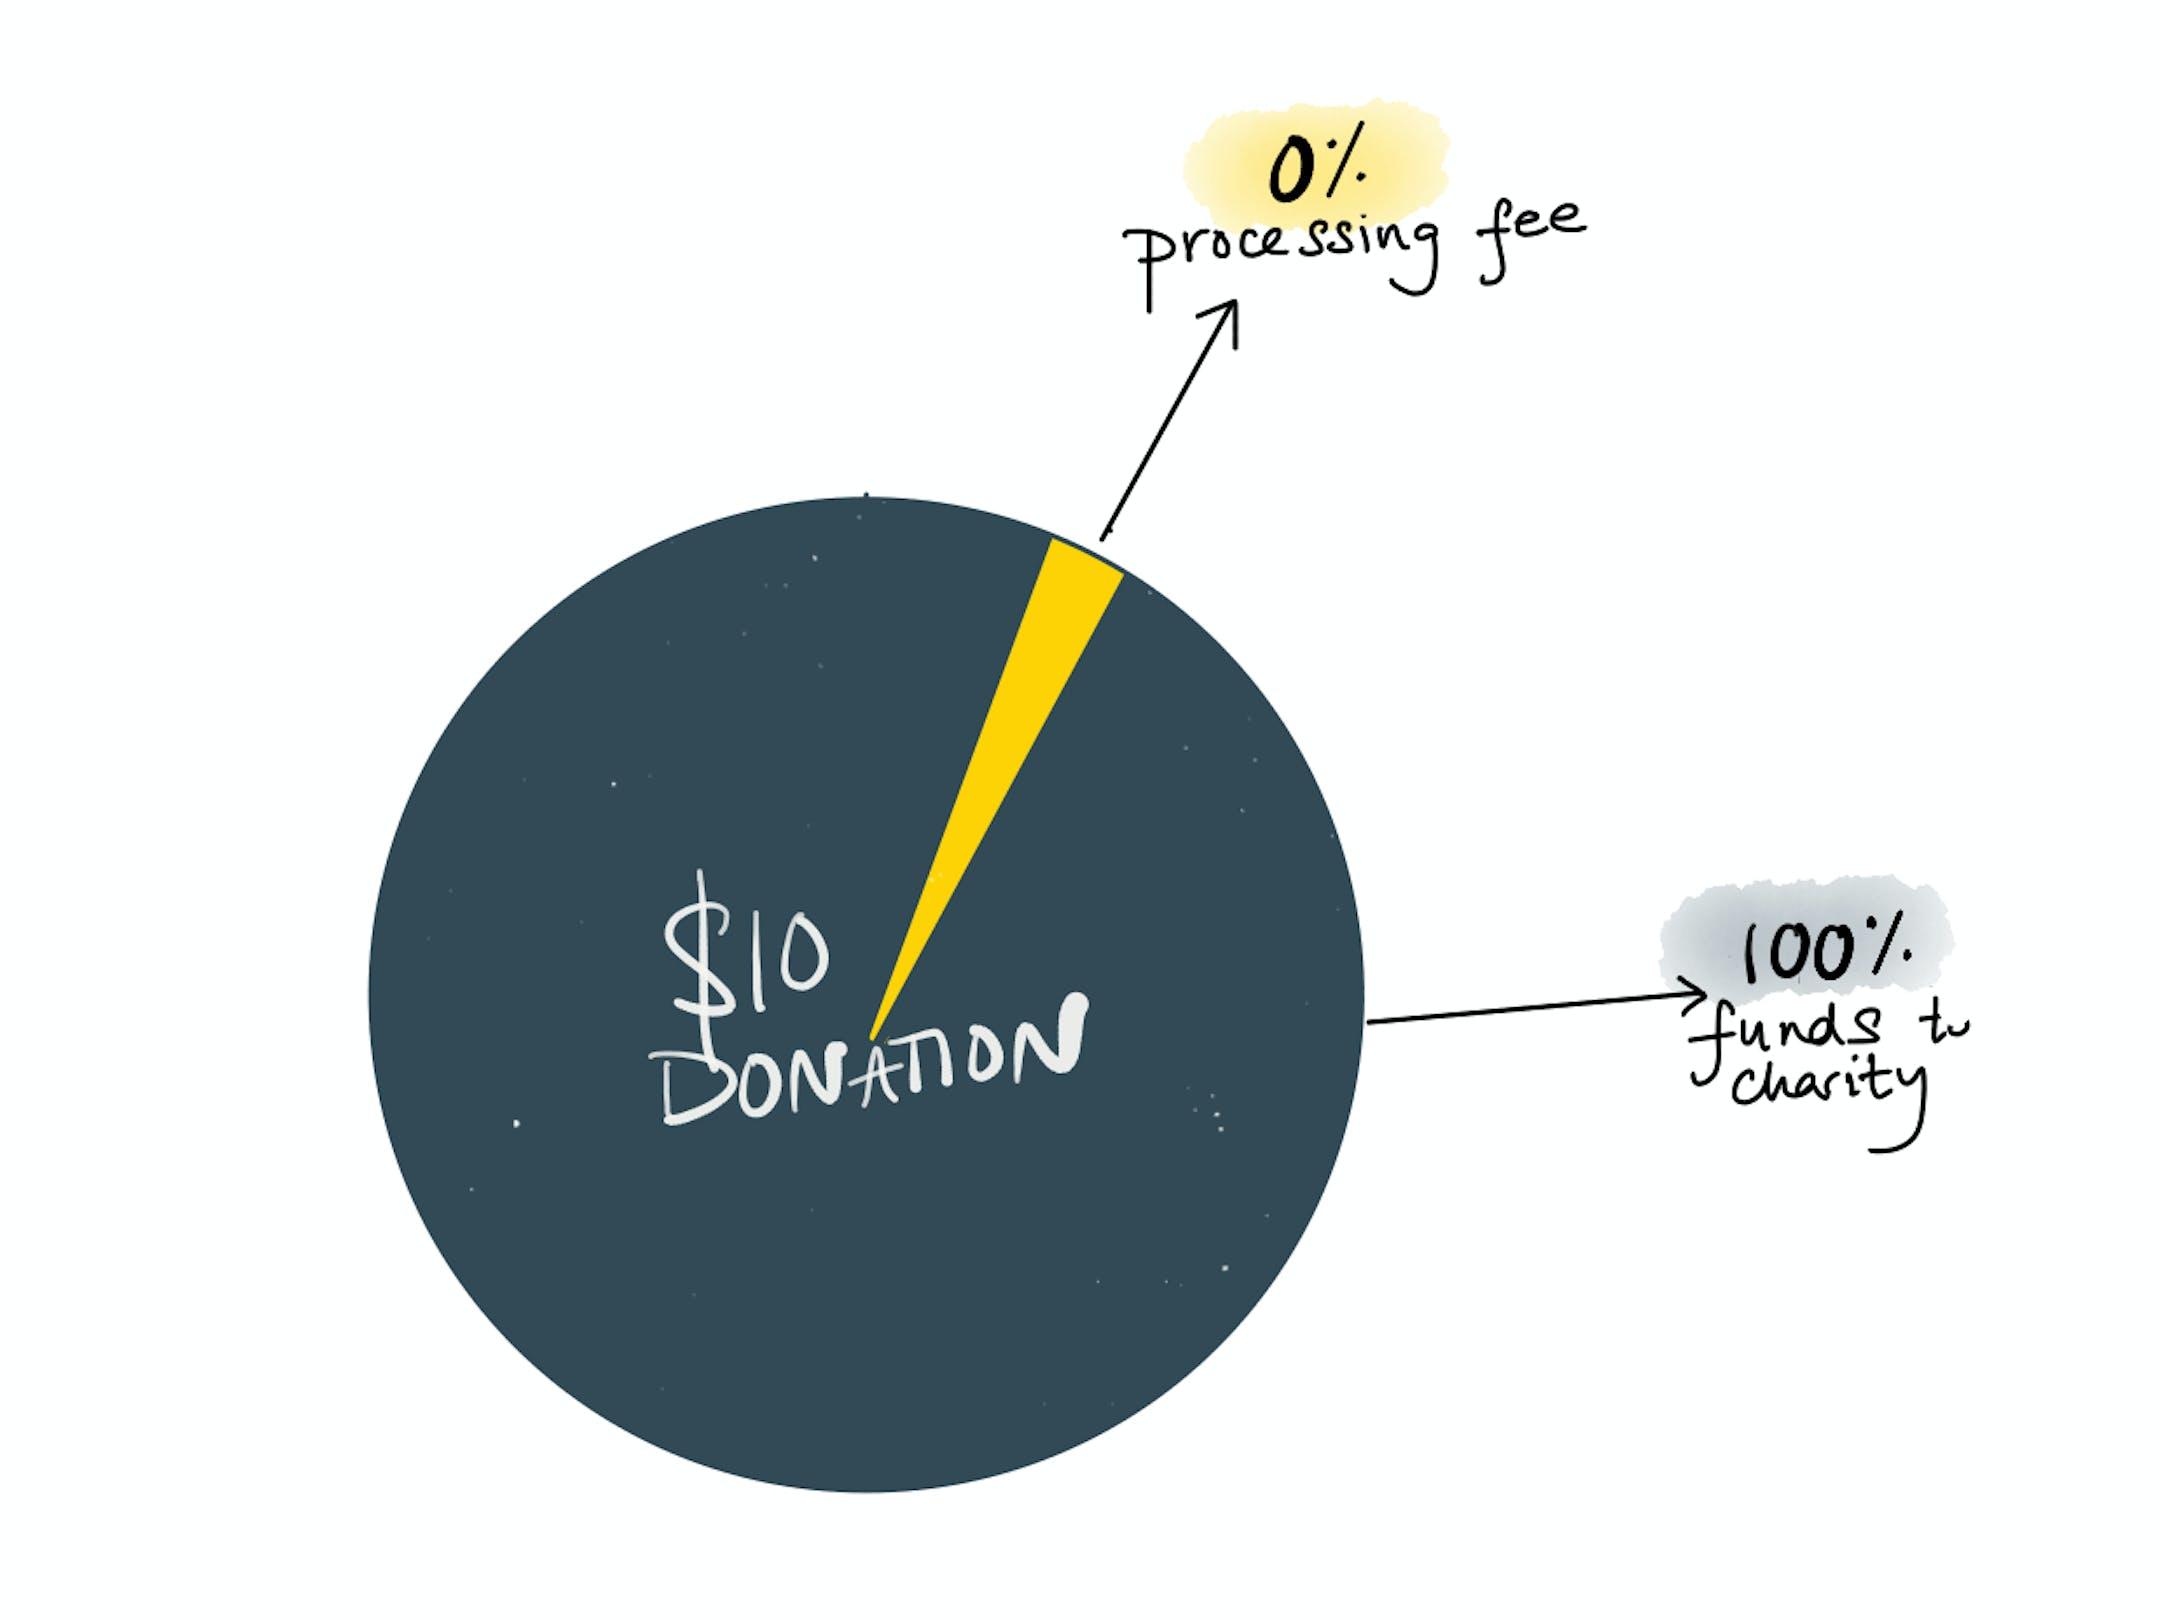 What happens when you make a donation via Checkout.com's payment gateway